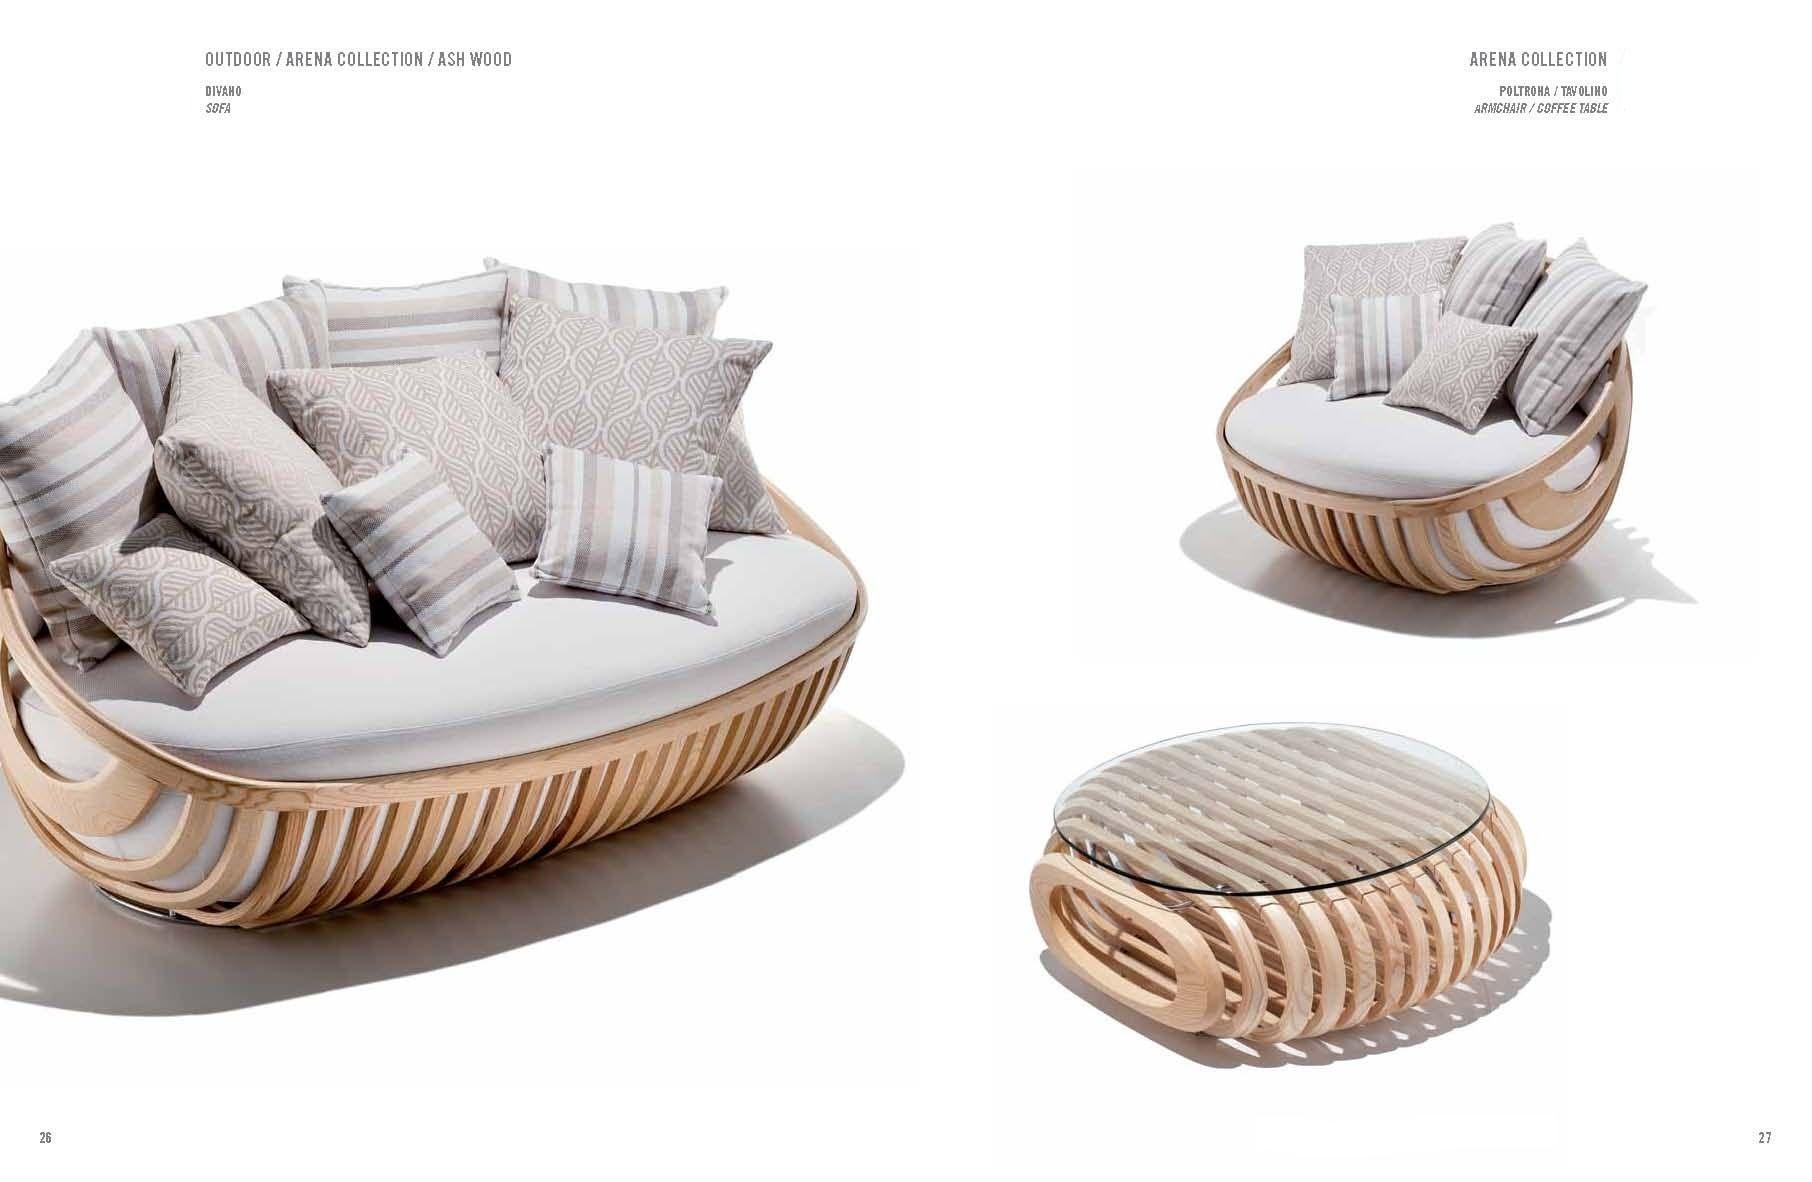 gartenm bel franchi arena serie gartenm beldie m bel aus italien. Black Bedroom Furniture Sets. Home Design Ideas